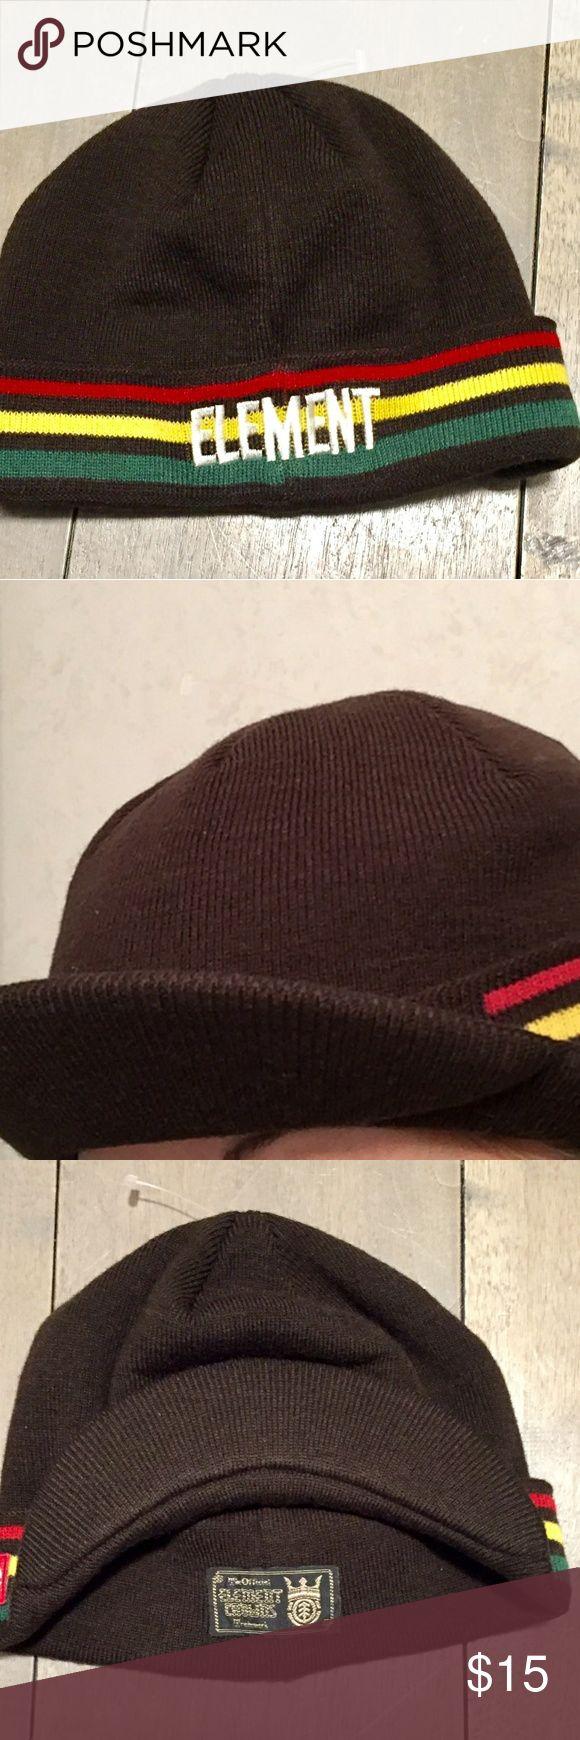 ELEMENT RASTAFARIAN HAT ELEMENT Rastafari style beanie hat. Unisex brown with green, gold, red stripe. Embroidered white element logo on back. Never worn. Hard to find. Element Accessories Hats